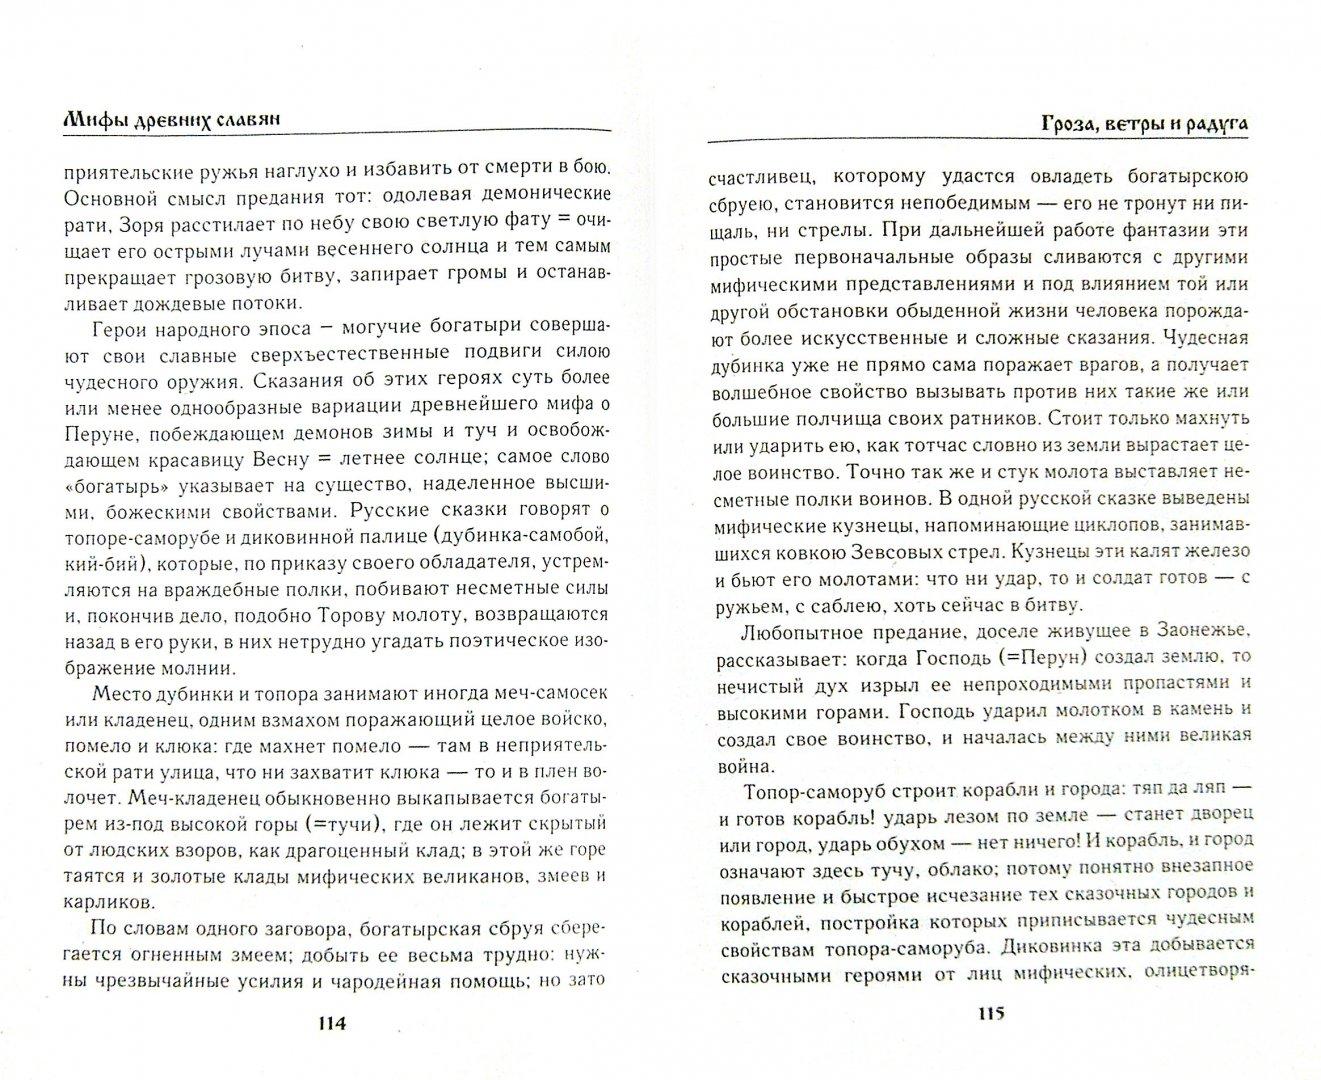 Иллюстрация 1 из 18 для Мифы древних славян - Александр Афанасьев | Лабиринт - книги. Источник: Лабиринт